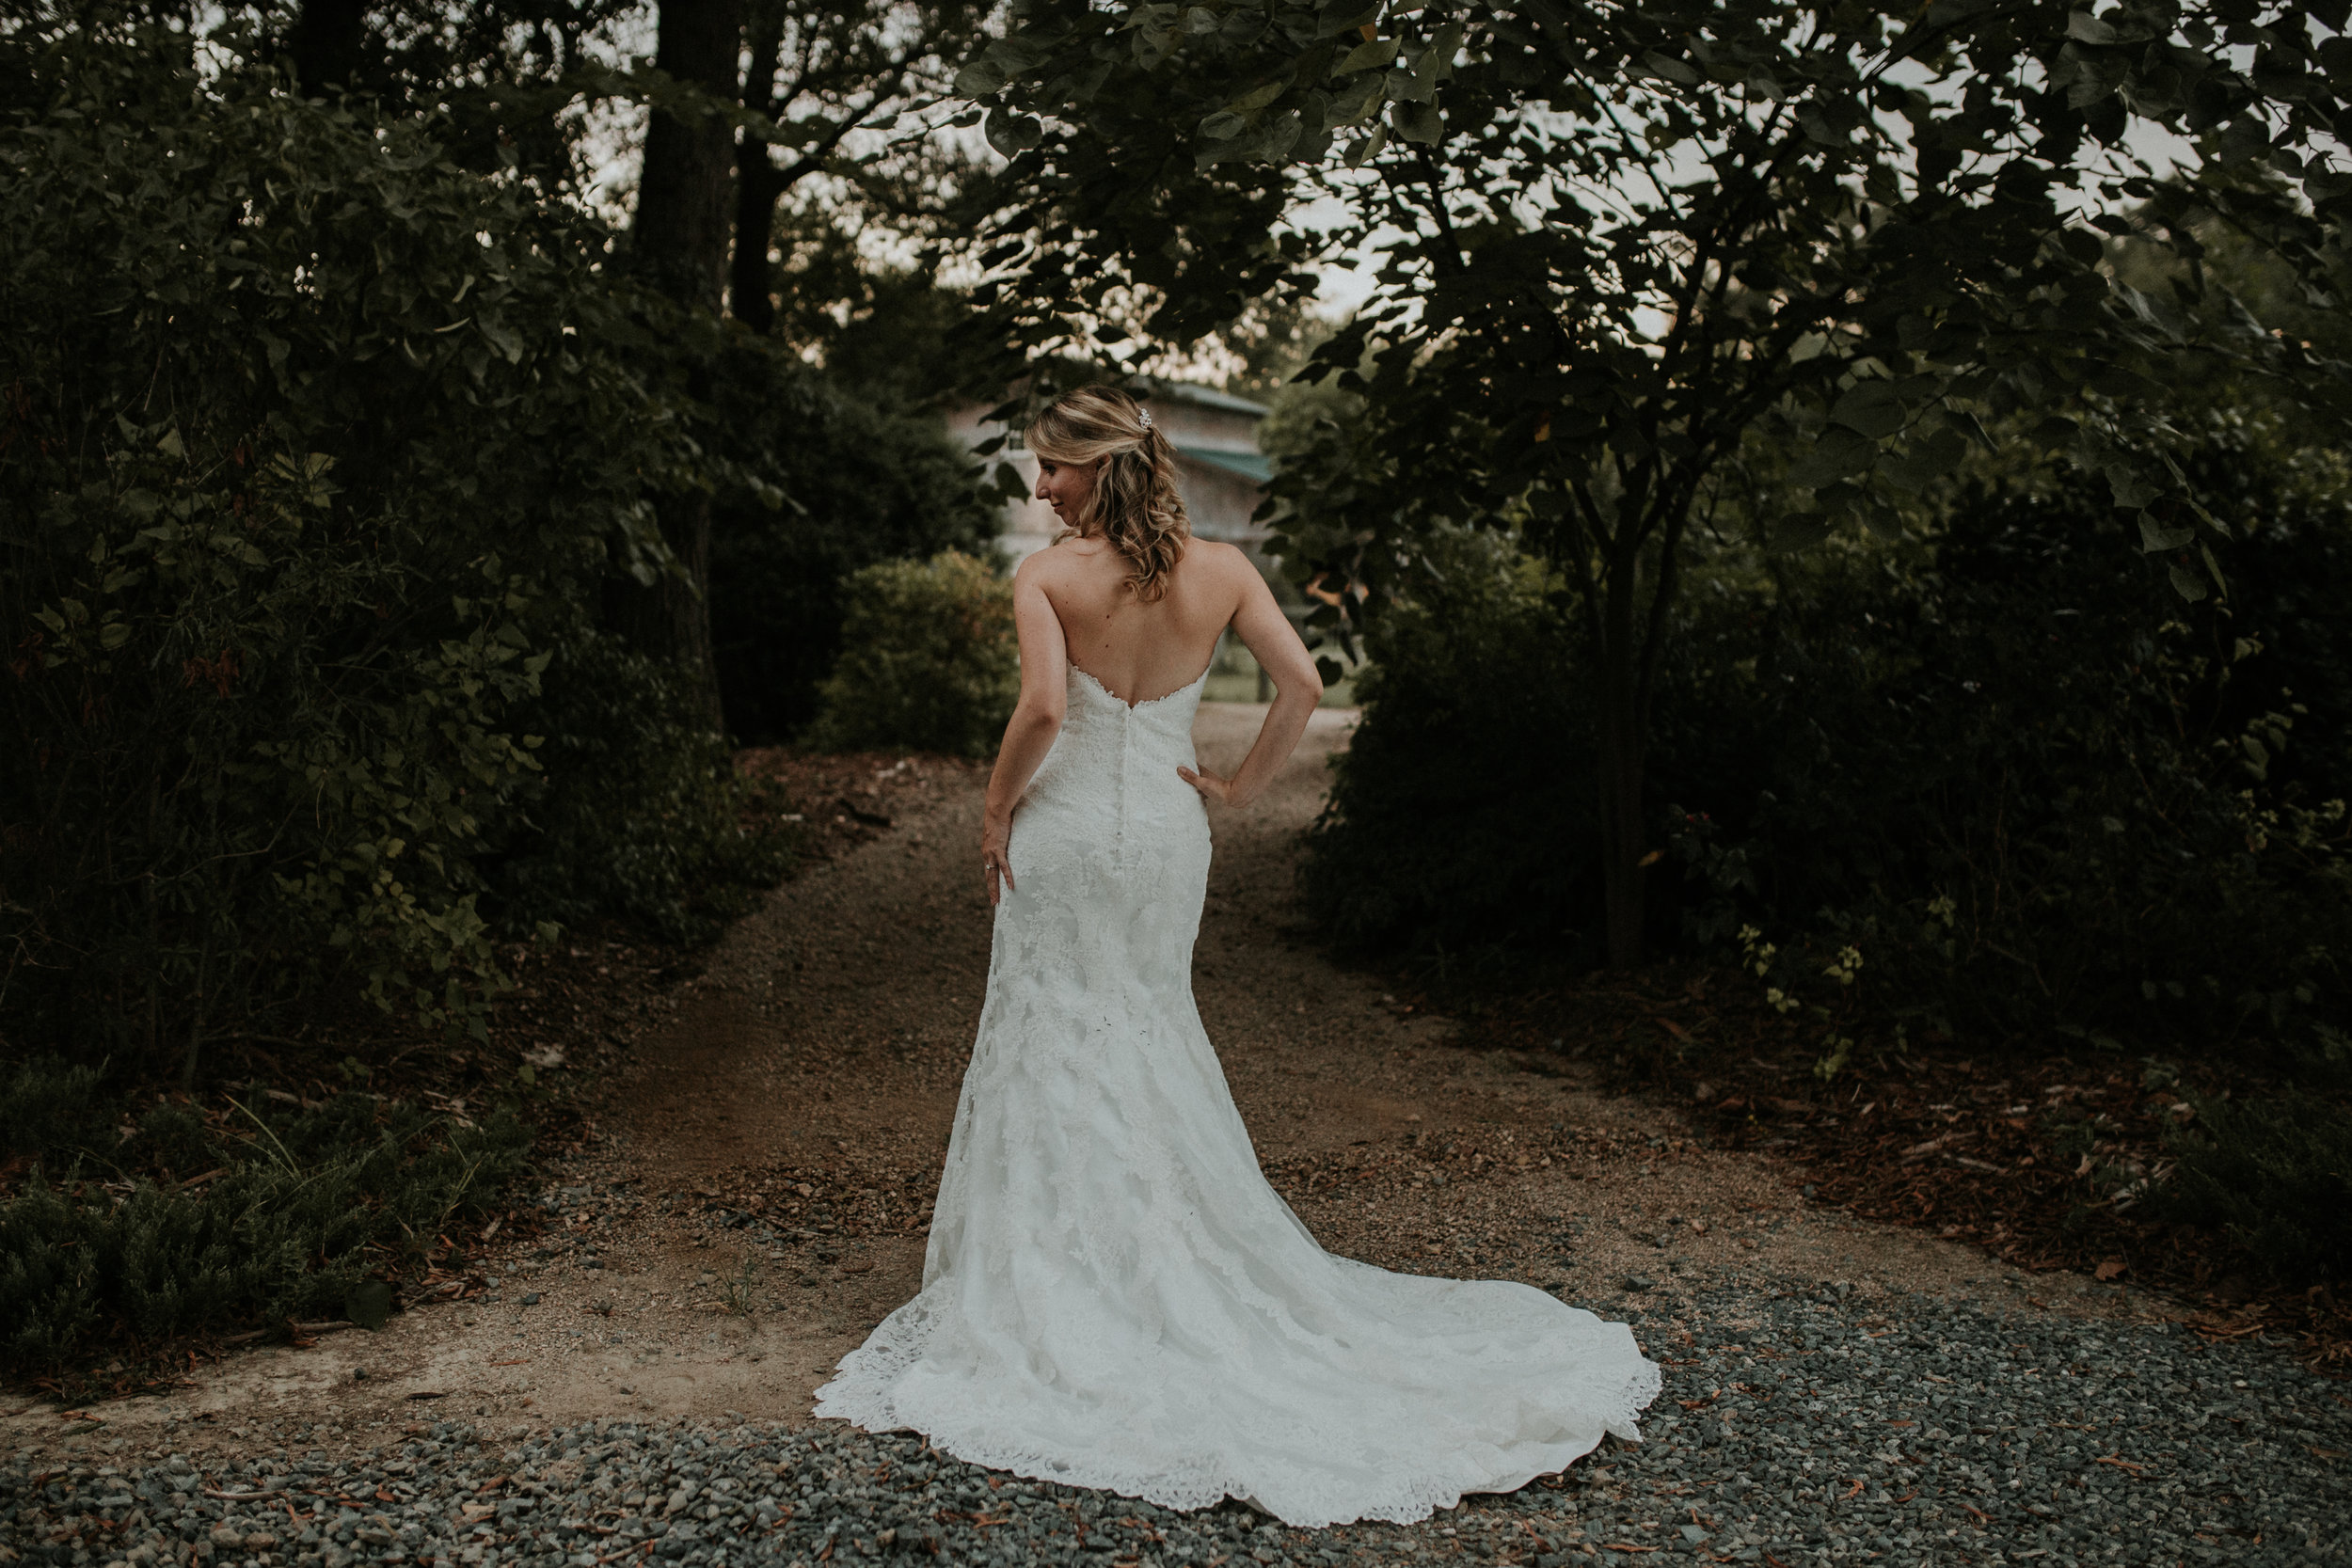 charlotte-wedding-photographer-daniel-stowe-2639.jpg